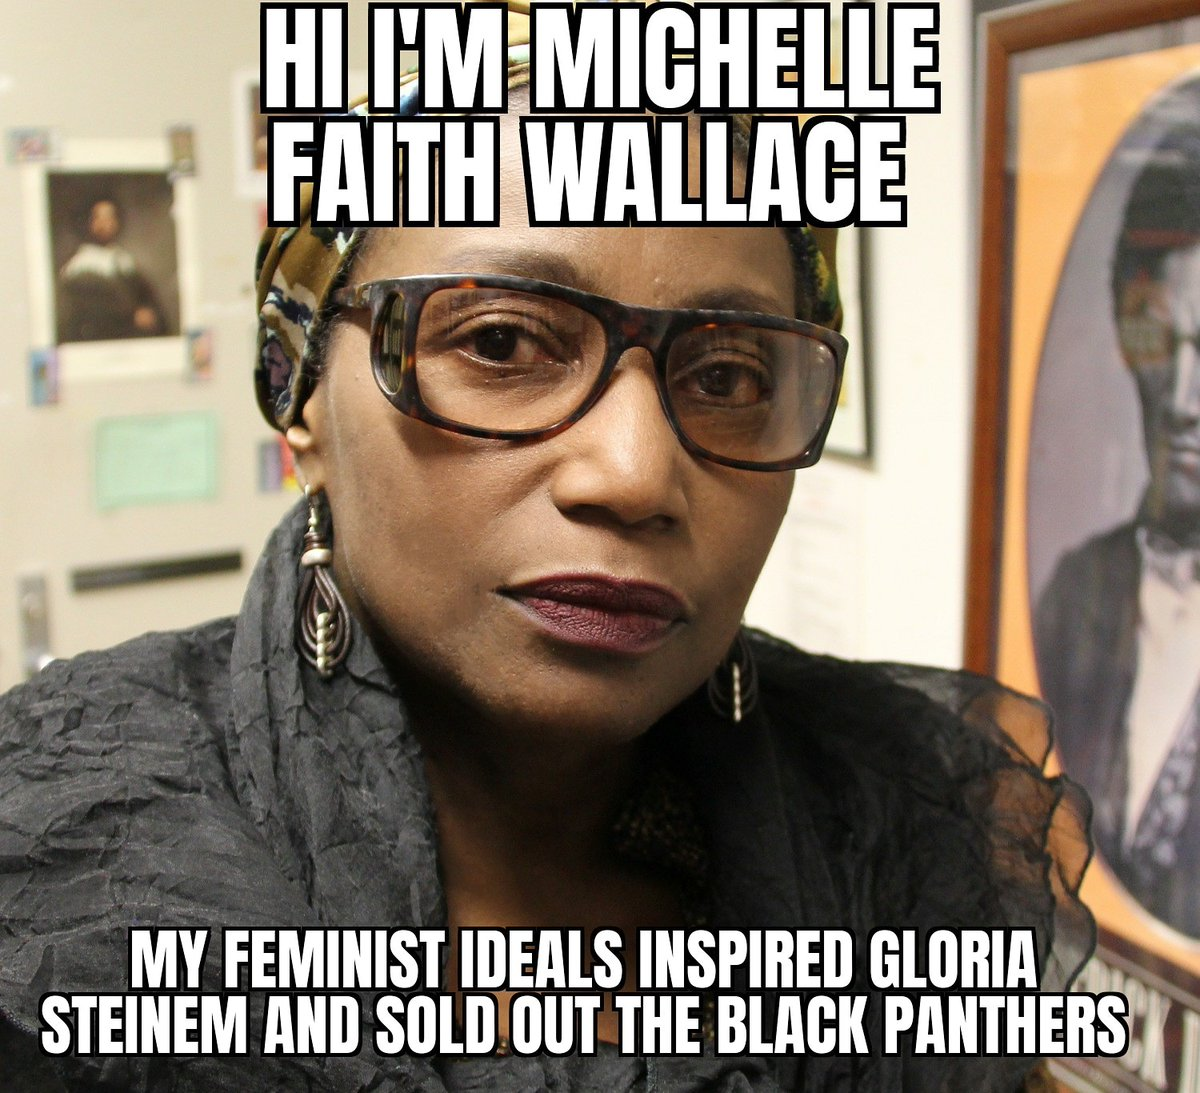 #memes #funnymemes #feministmemes #comedy #funny #jokes #chicodeoro12 #society #SocialCommentary #SocialObservation #sociology #psychology #Philosophy #blm #blacklivesmatter#blacklivesmatter #blacklesbians #blacklivesmatter#blacklivesmatters #feminismpic.twitter.com/7pUOlscTen